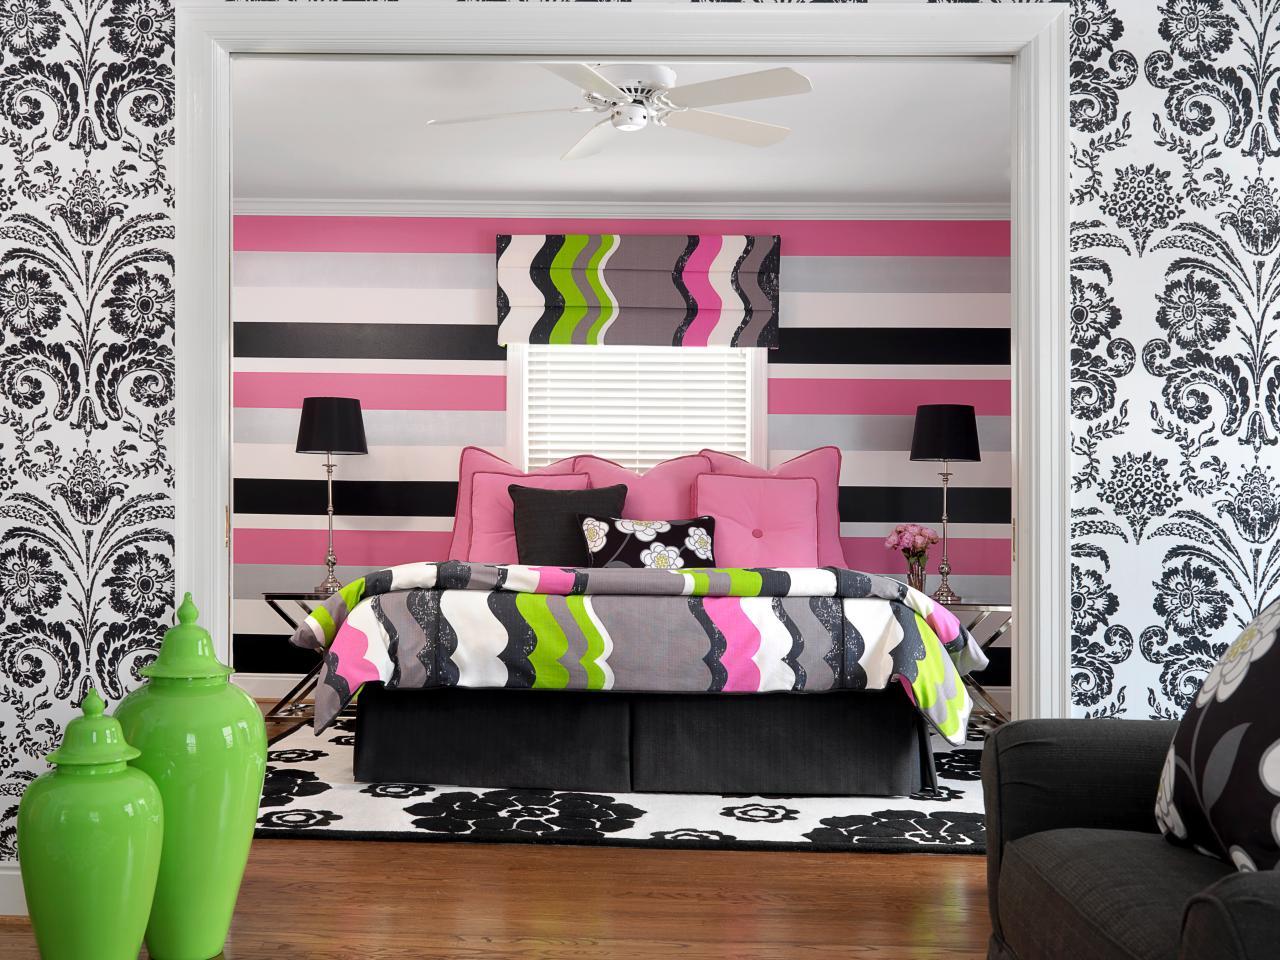 25 dise os que har n inspirarte para decorar tu habitaci n for Disenos para pintar paredes de habitaciones